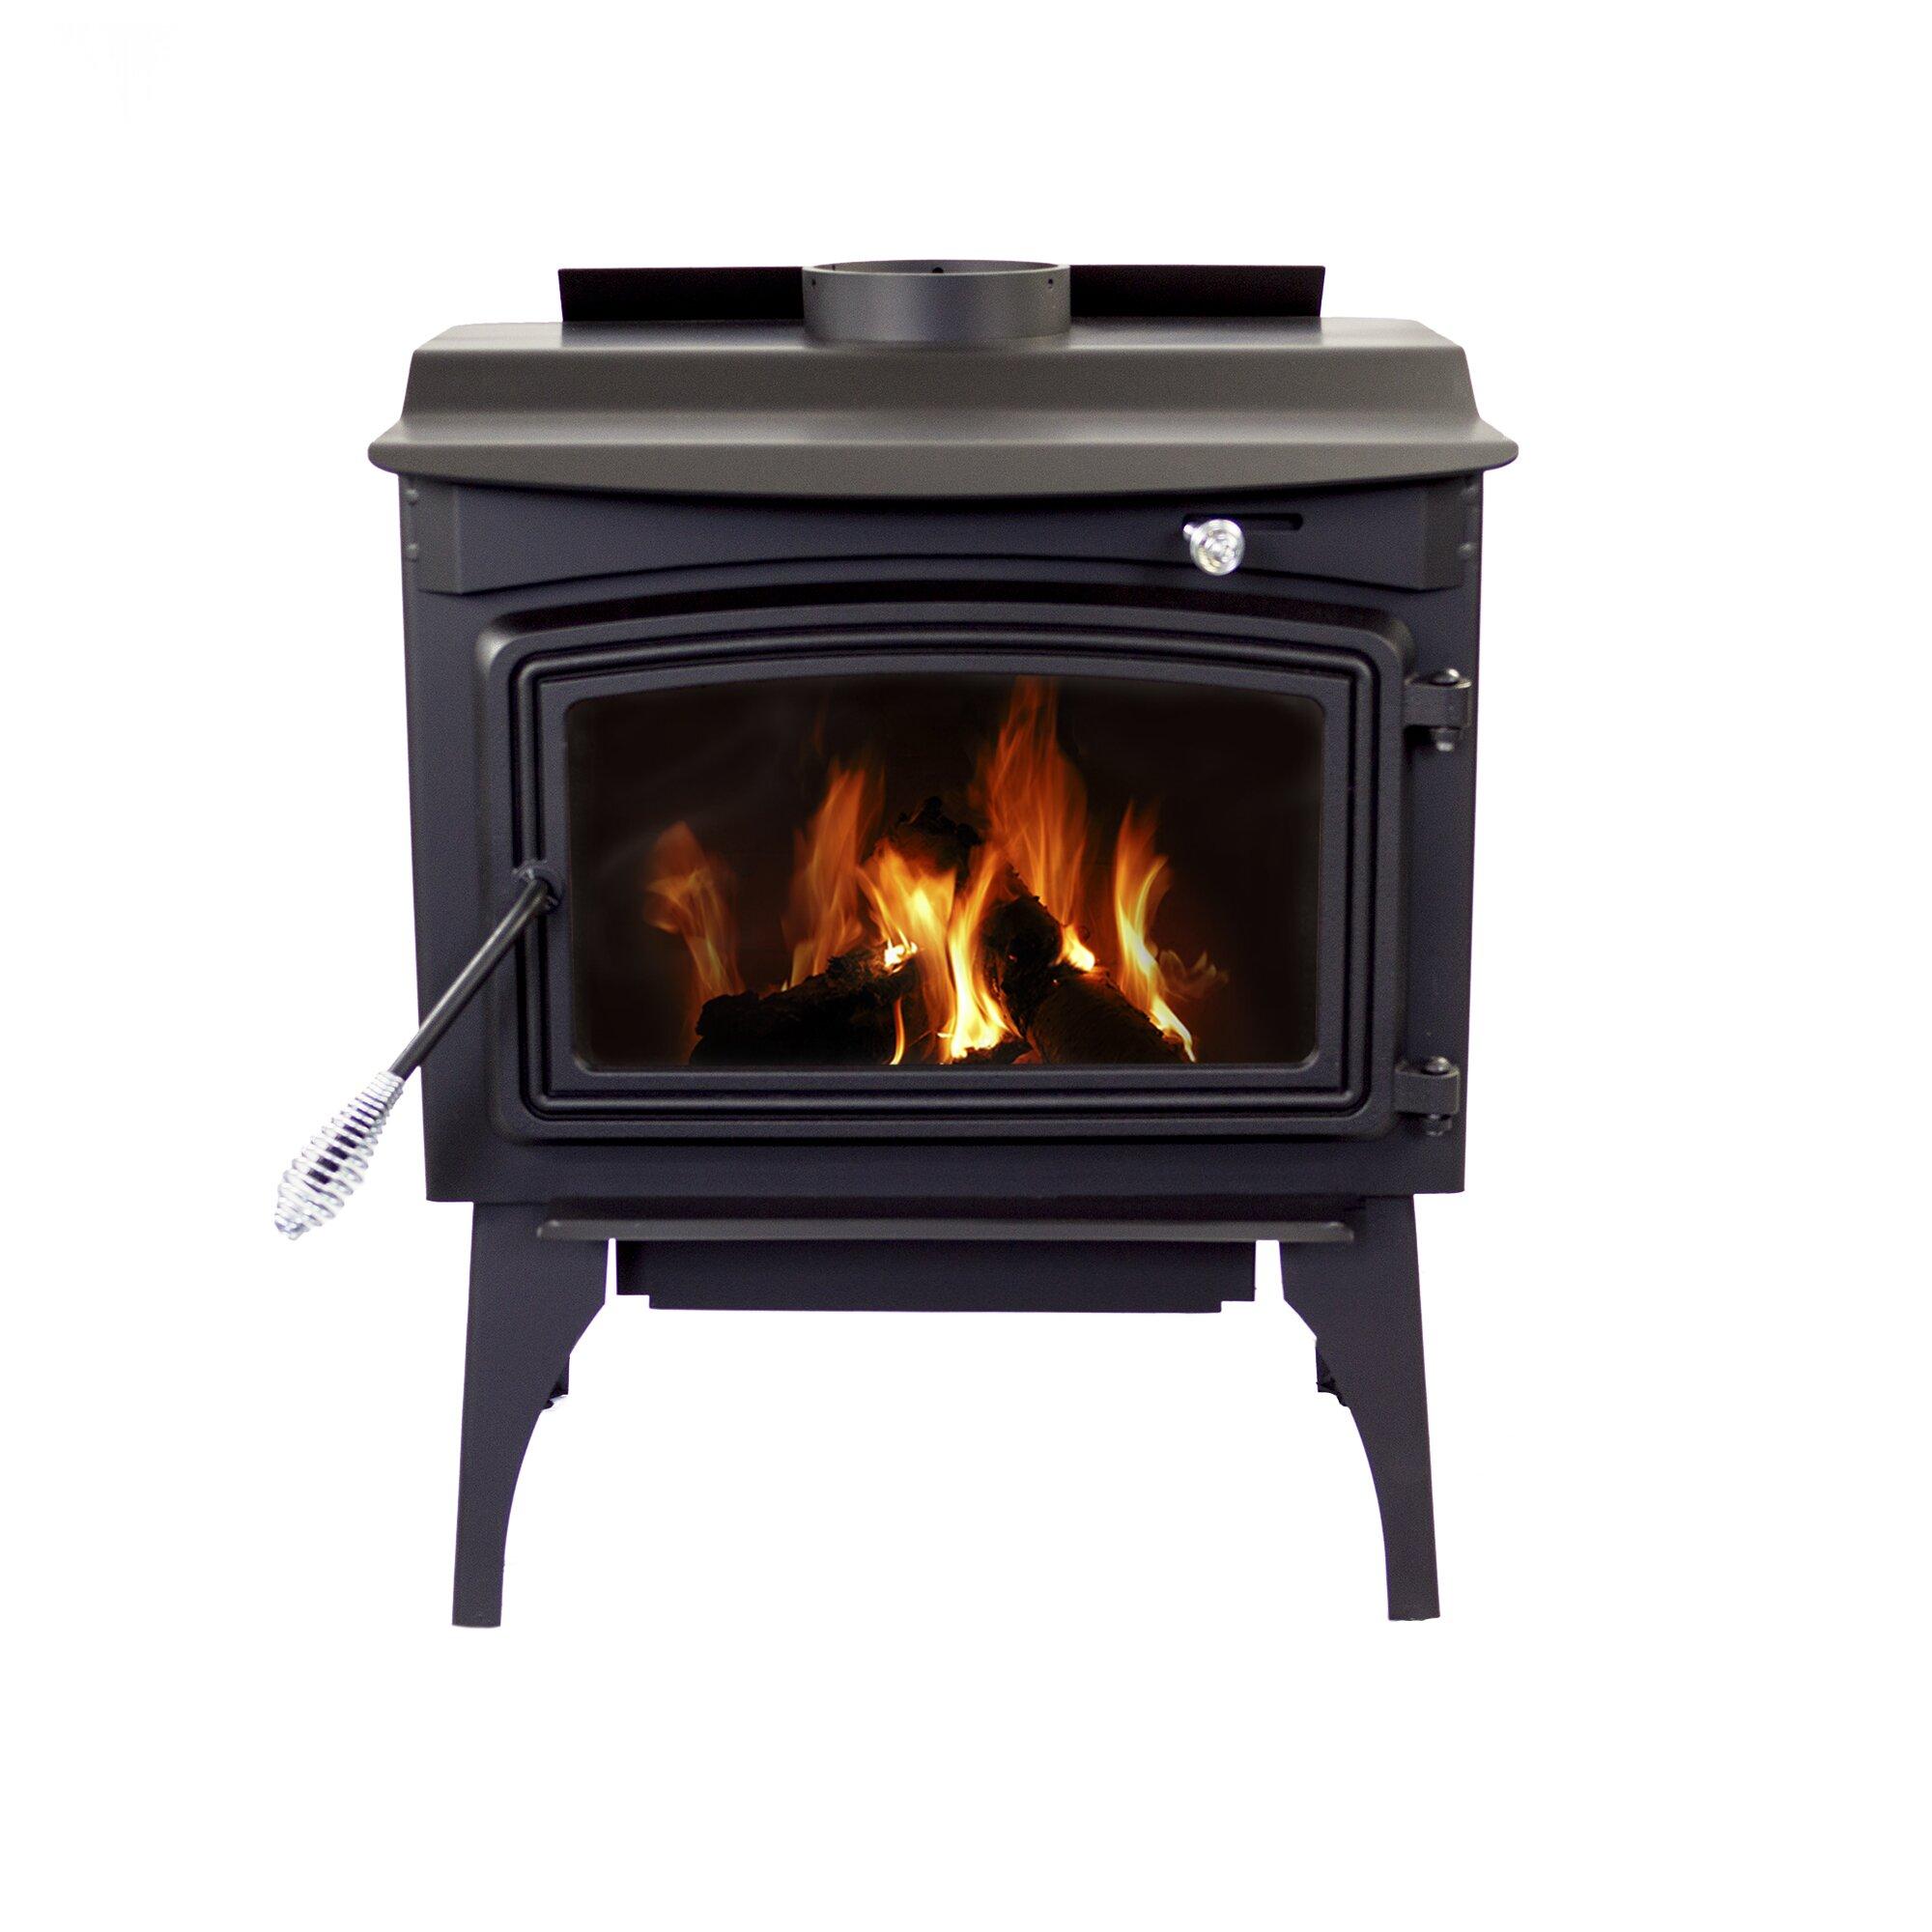 Pleasant Hearth: Dyna-Glo Pleasant Hearth Wood Burning Fireplace